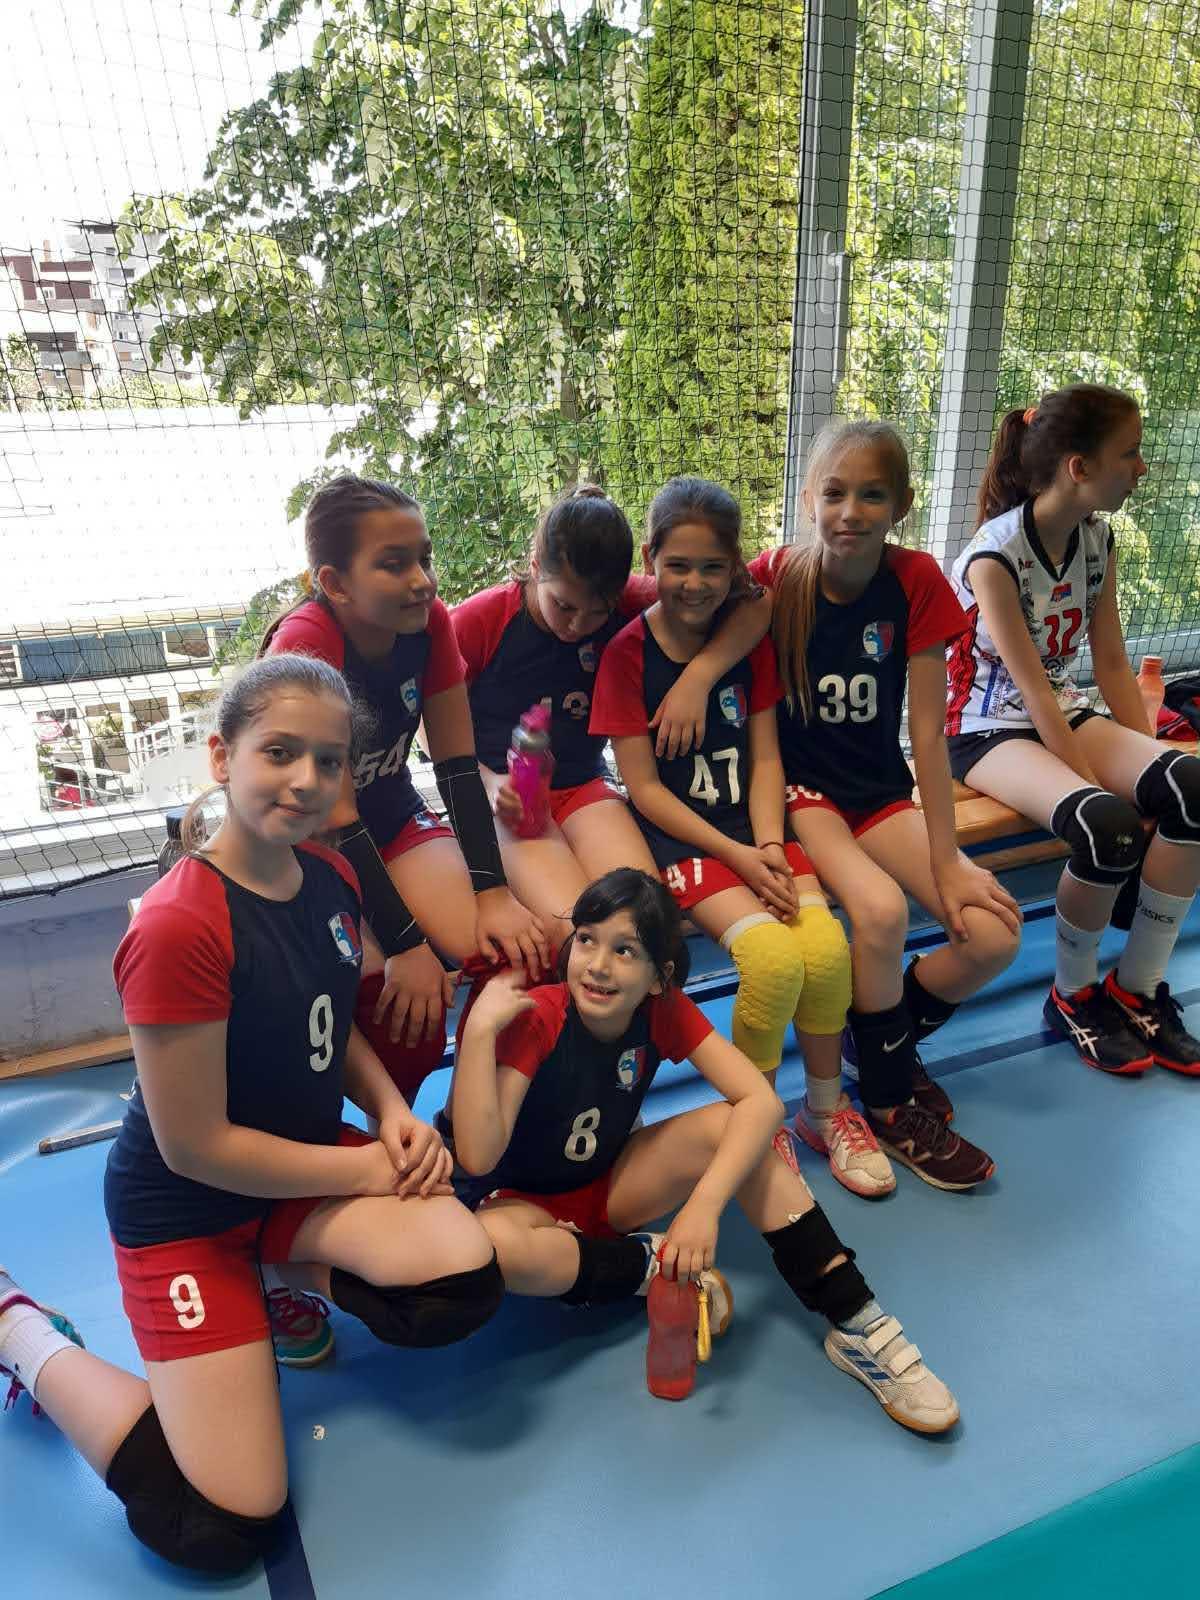 Druženje | Mini Volley liga | III - IV kolo | sezona | 2020/2021 - 4